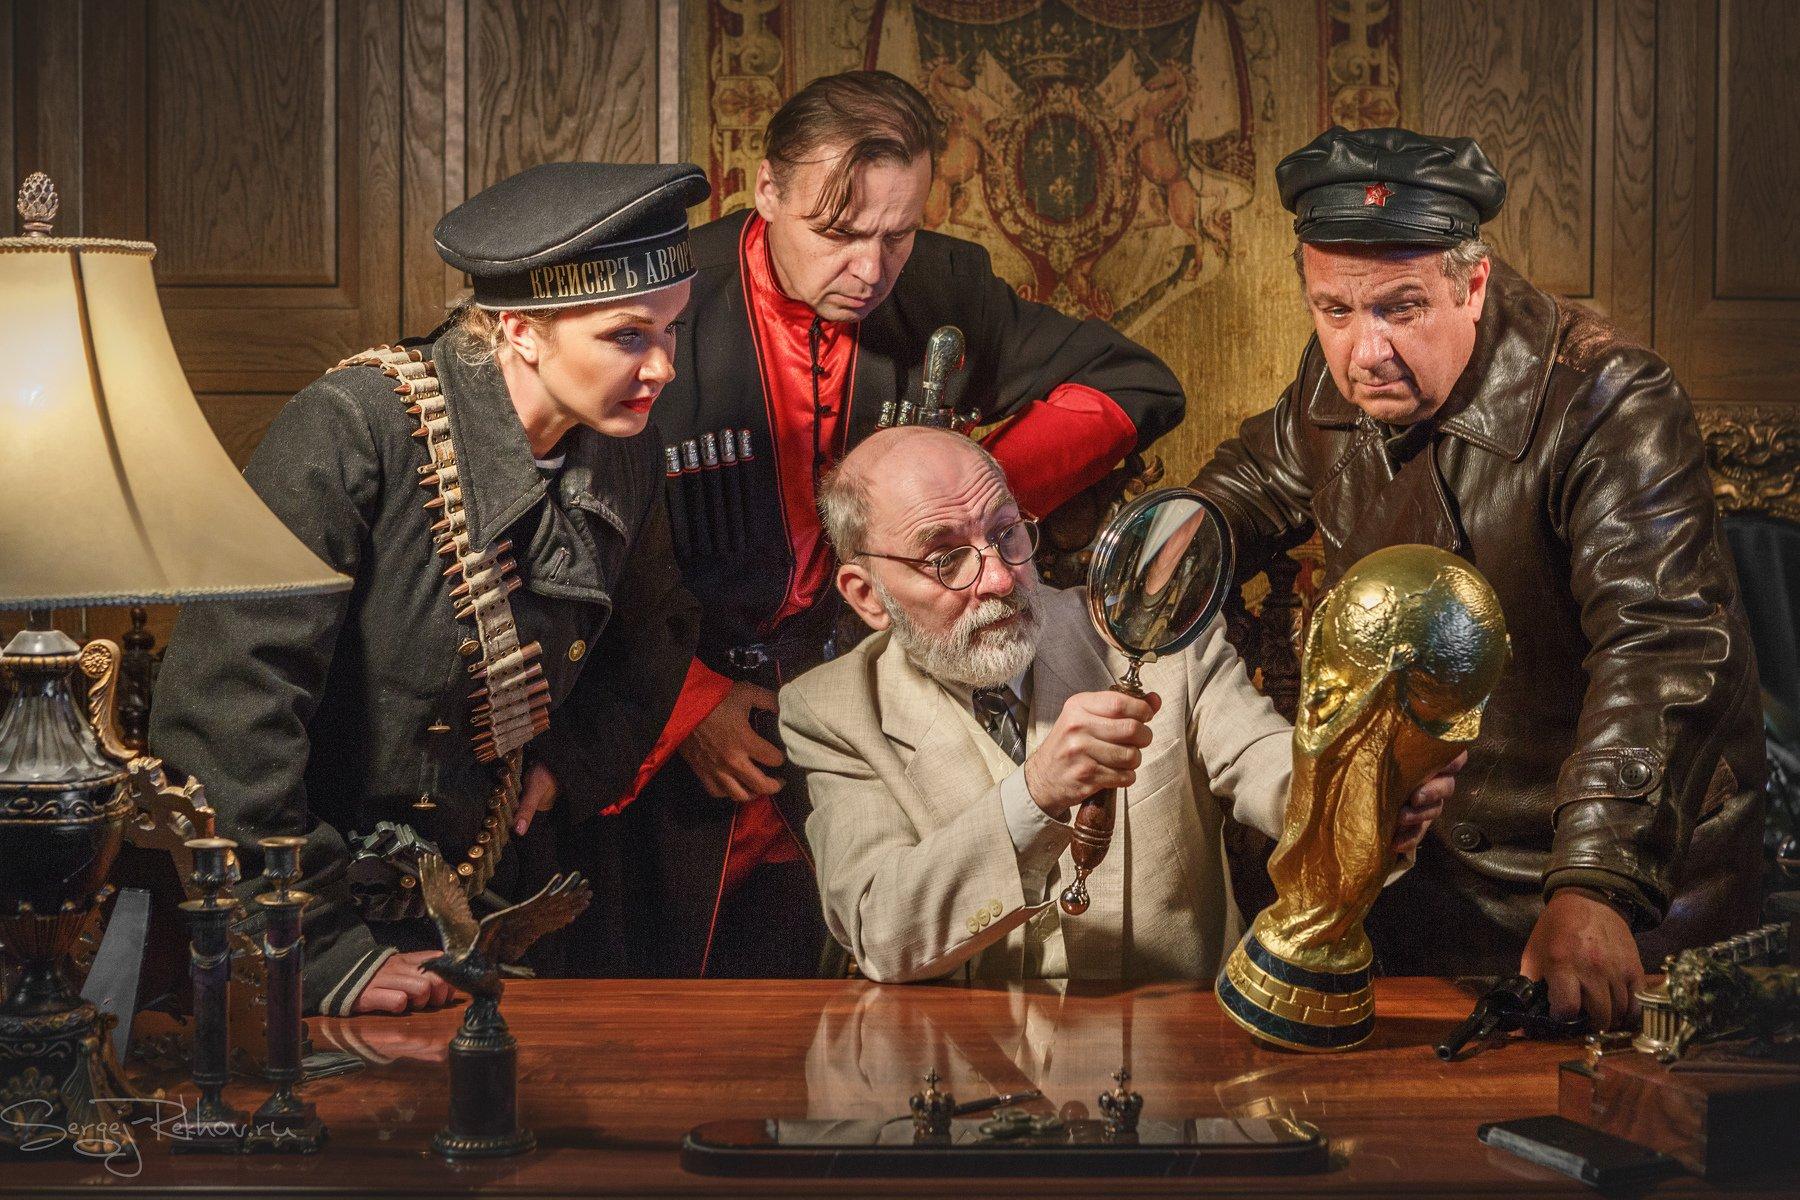 студия, студия цитадель, антиквар, революционеры, rekhov, Сергей Рехов